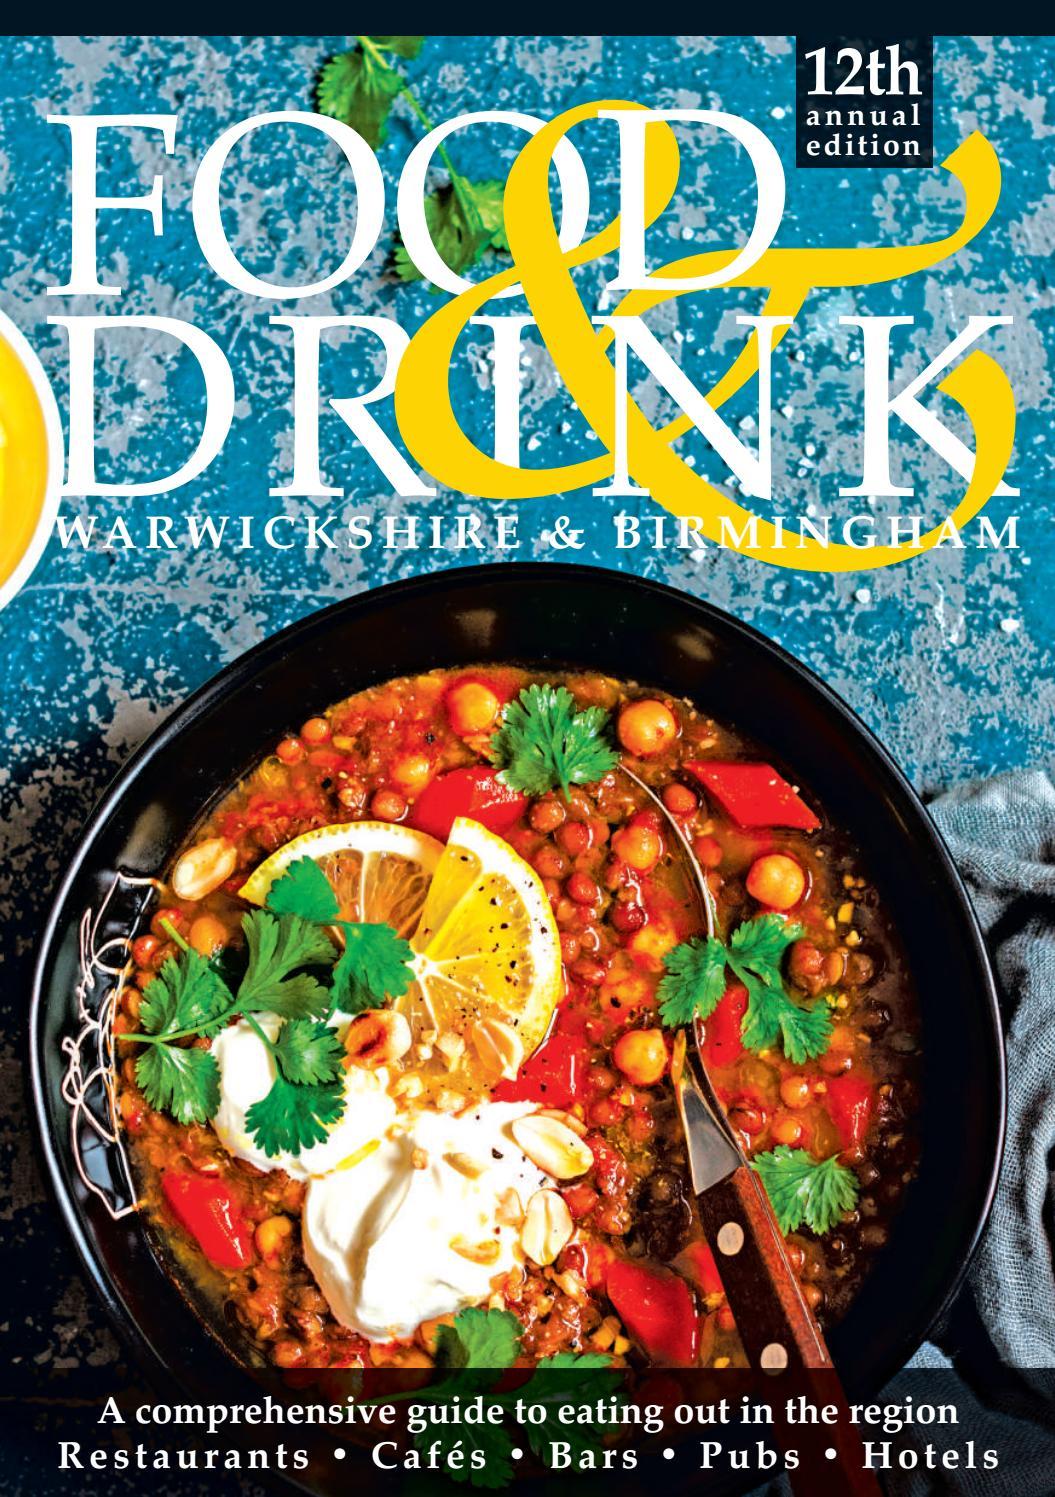 Warwickshire Birmingham Food Drink Guide 2019 By Food